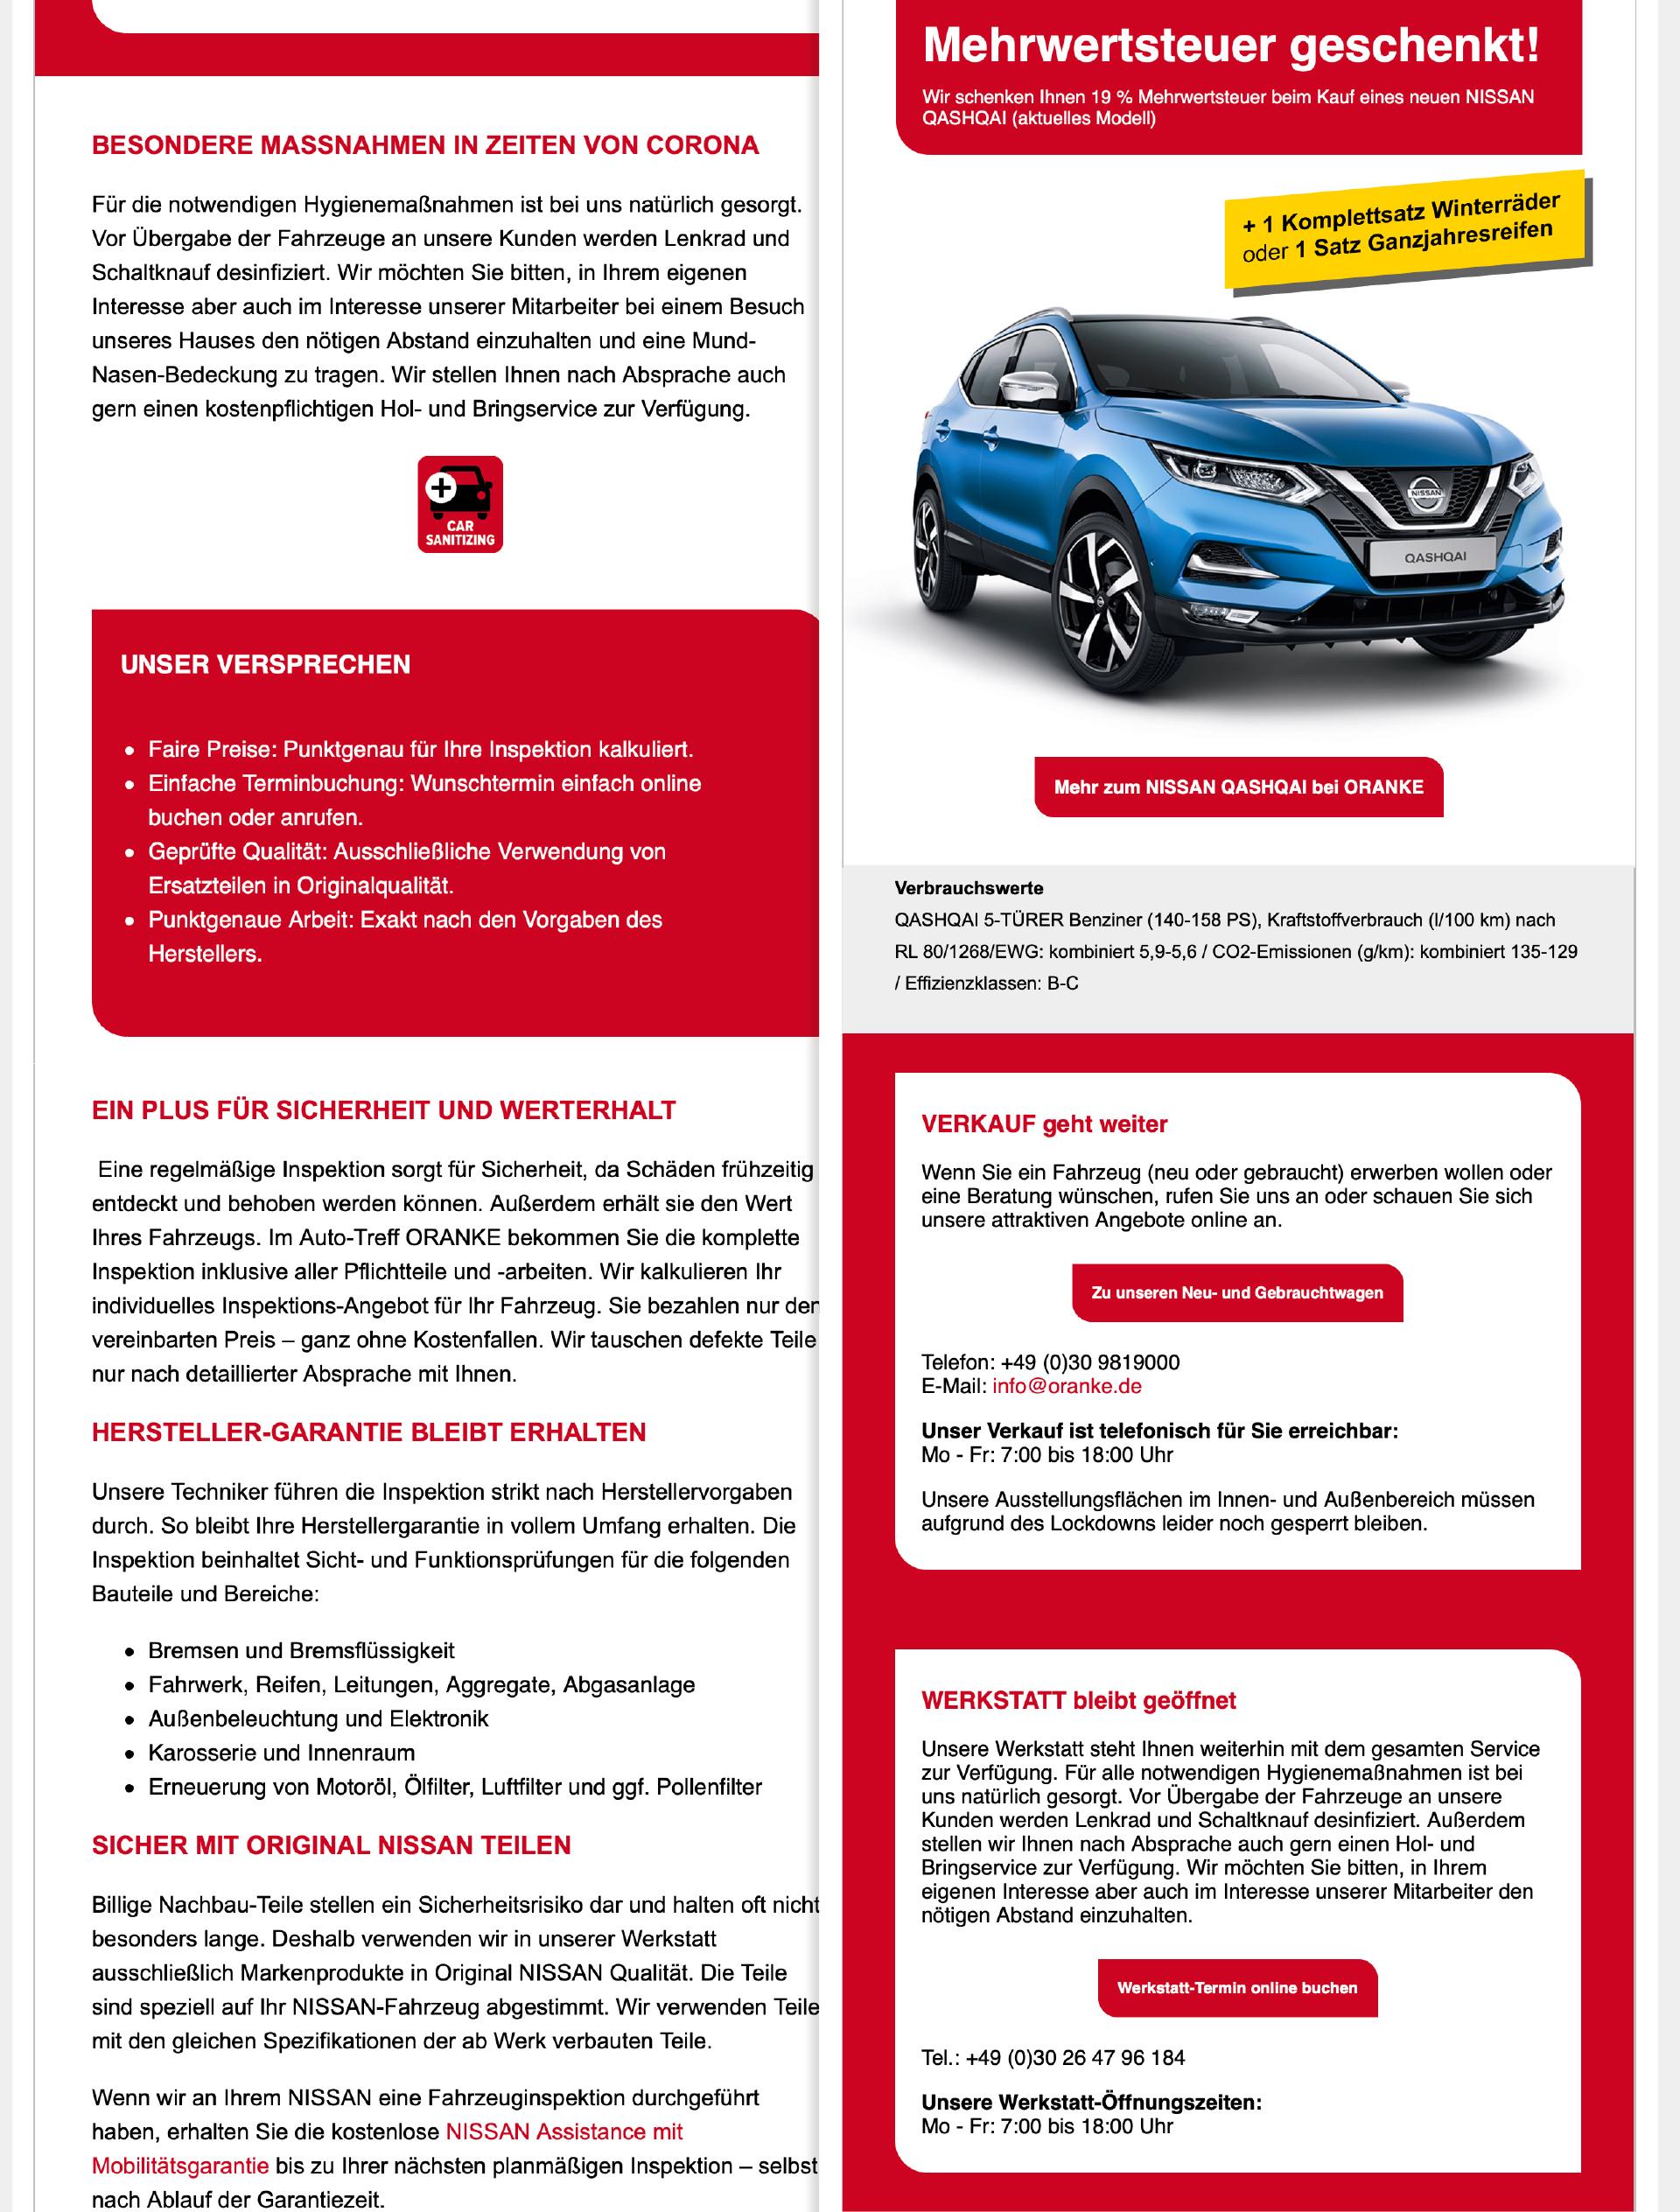 Referenz agreement – Newsletter 02